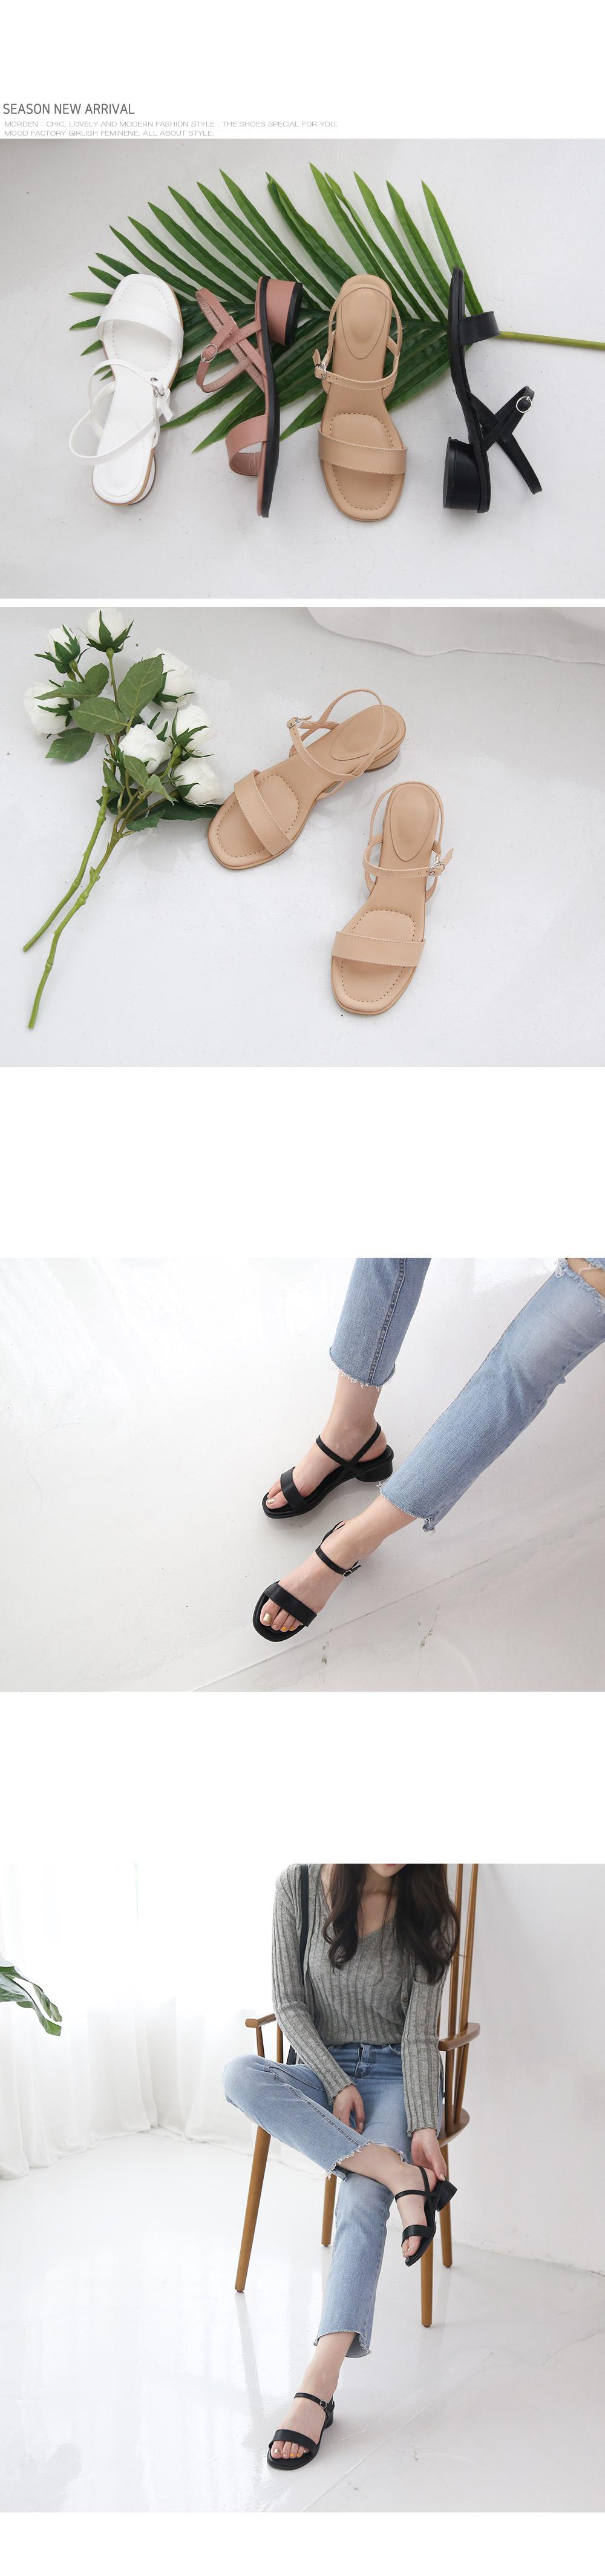 [Handmade] Basic Buckle Strap Sandals-holiholic.com